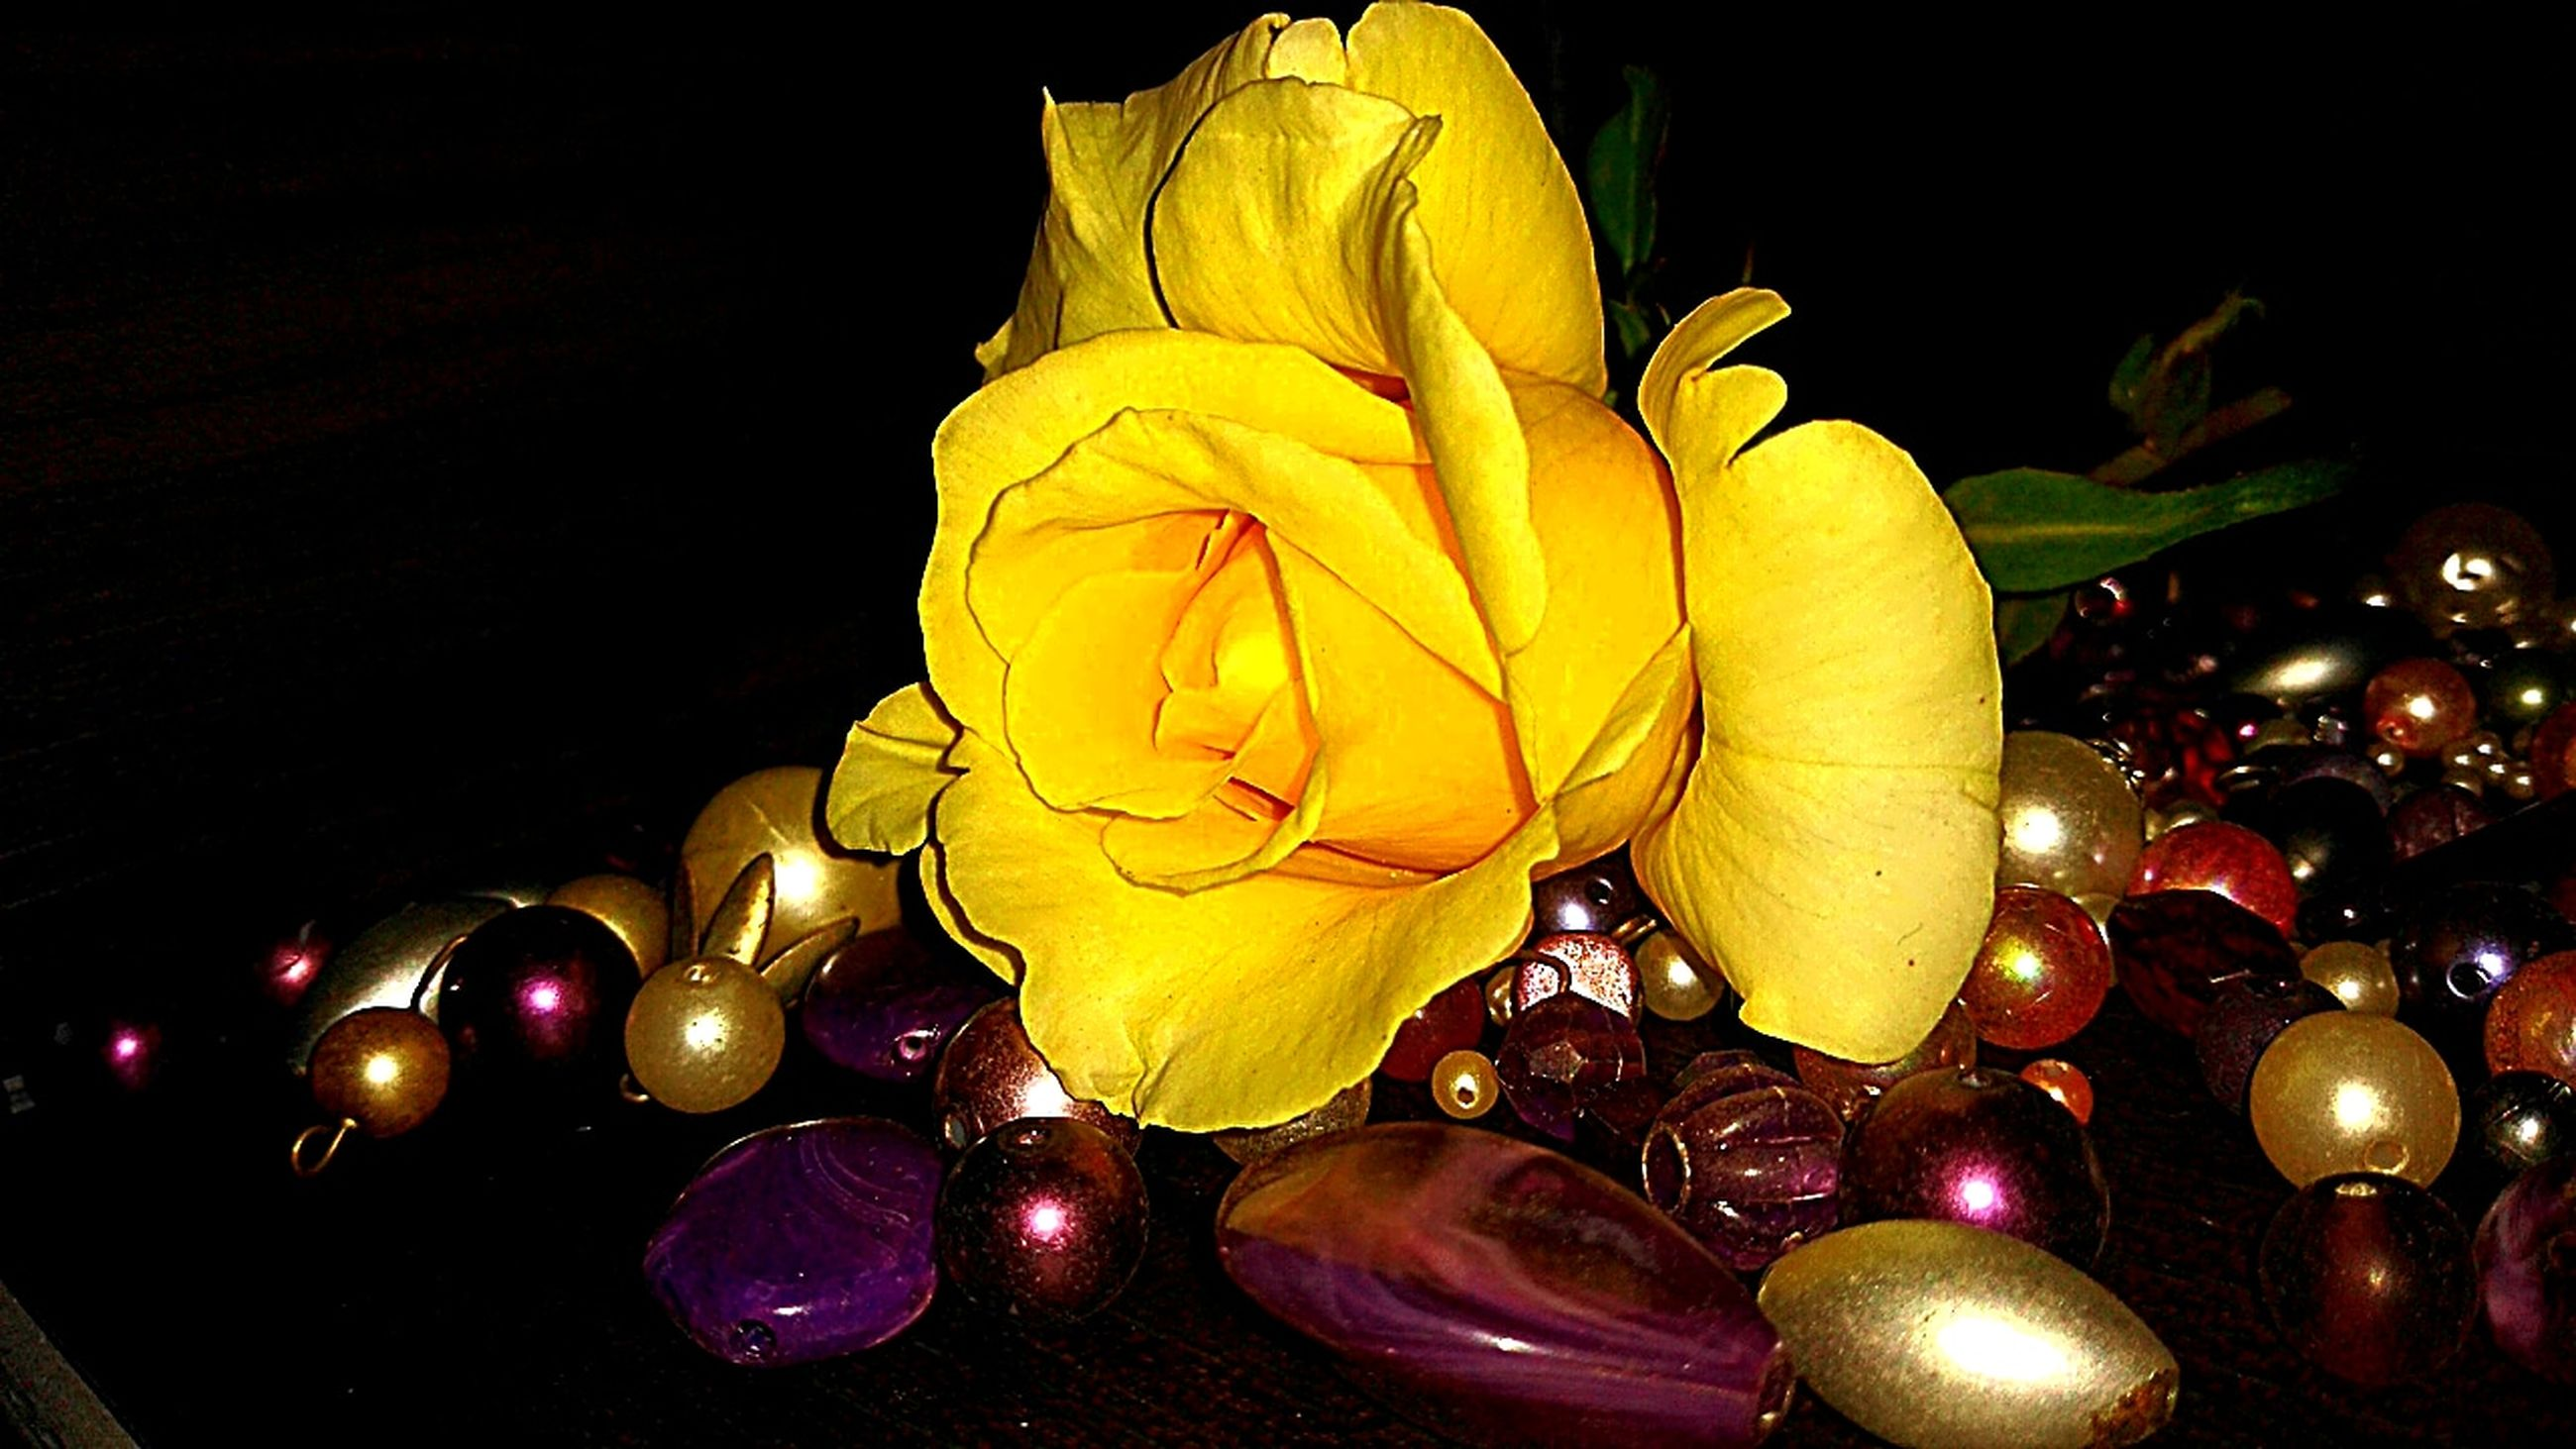 yellow, night, no people, indoors, close-up, decoration, studio shot, black background, illuminated, freshness, plant, celebration, flowering plant, flower, glowing, low angle view, lighting equipment, nature, religion